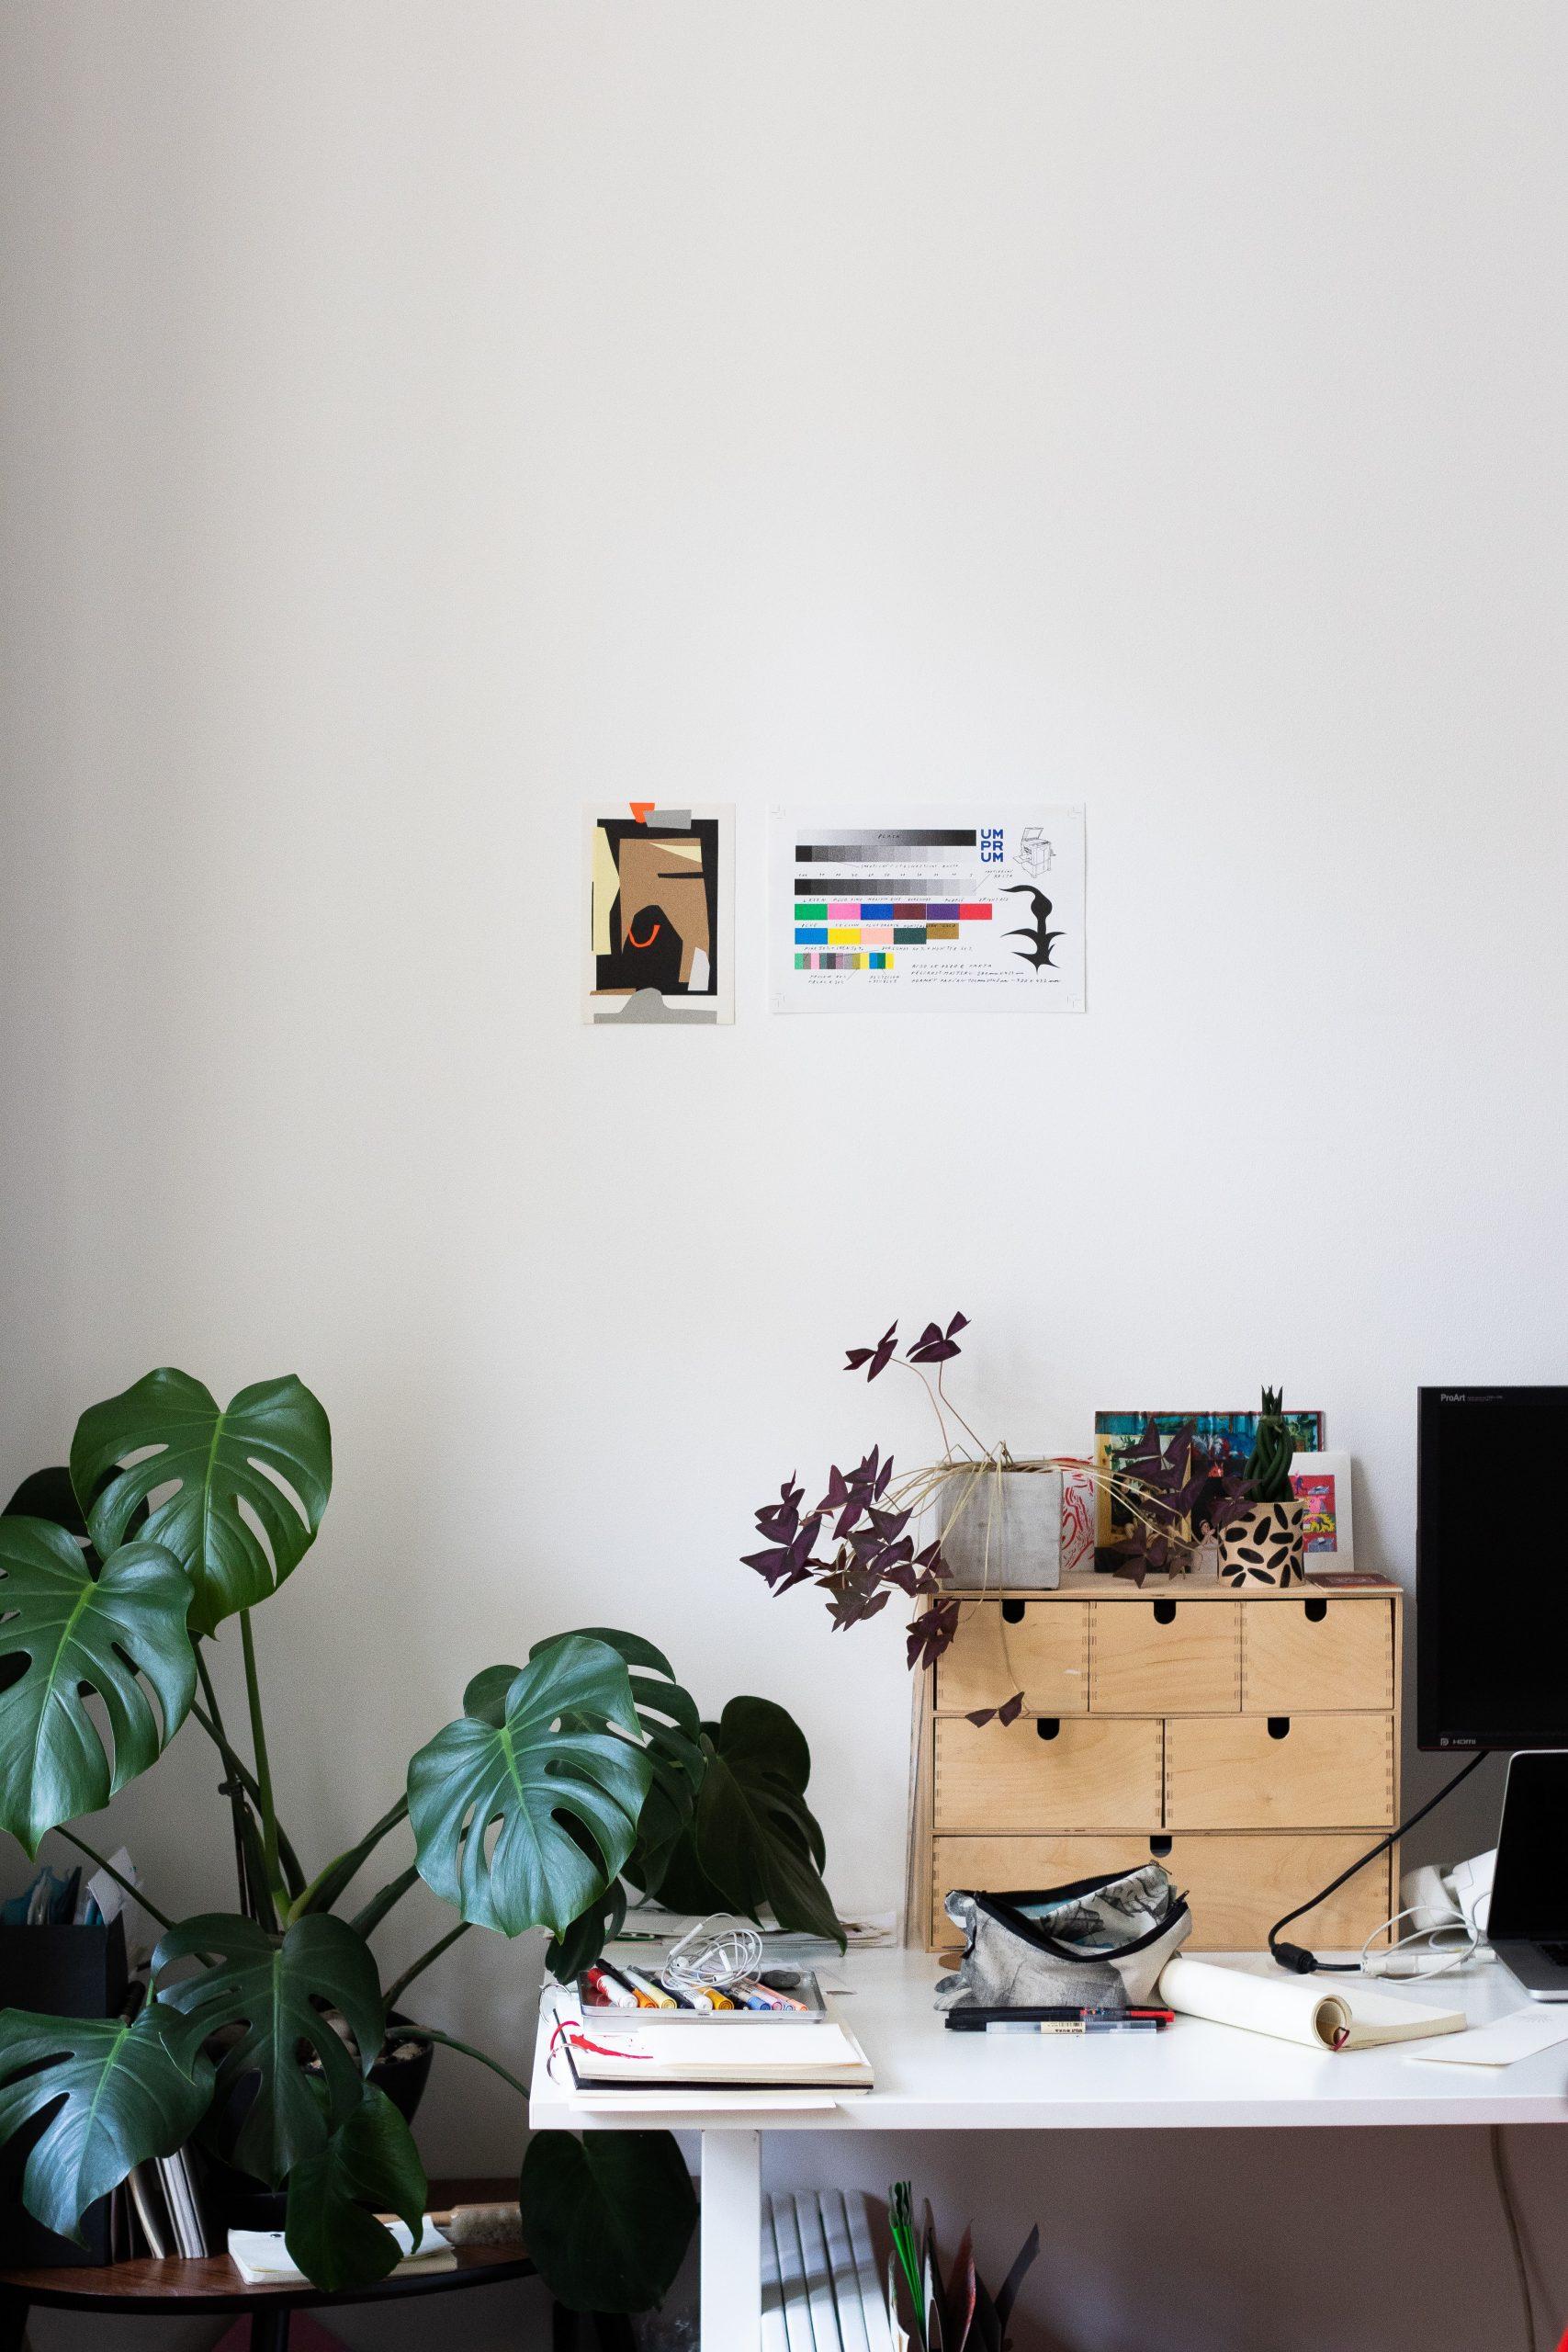 productivity in isolation